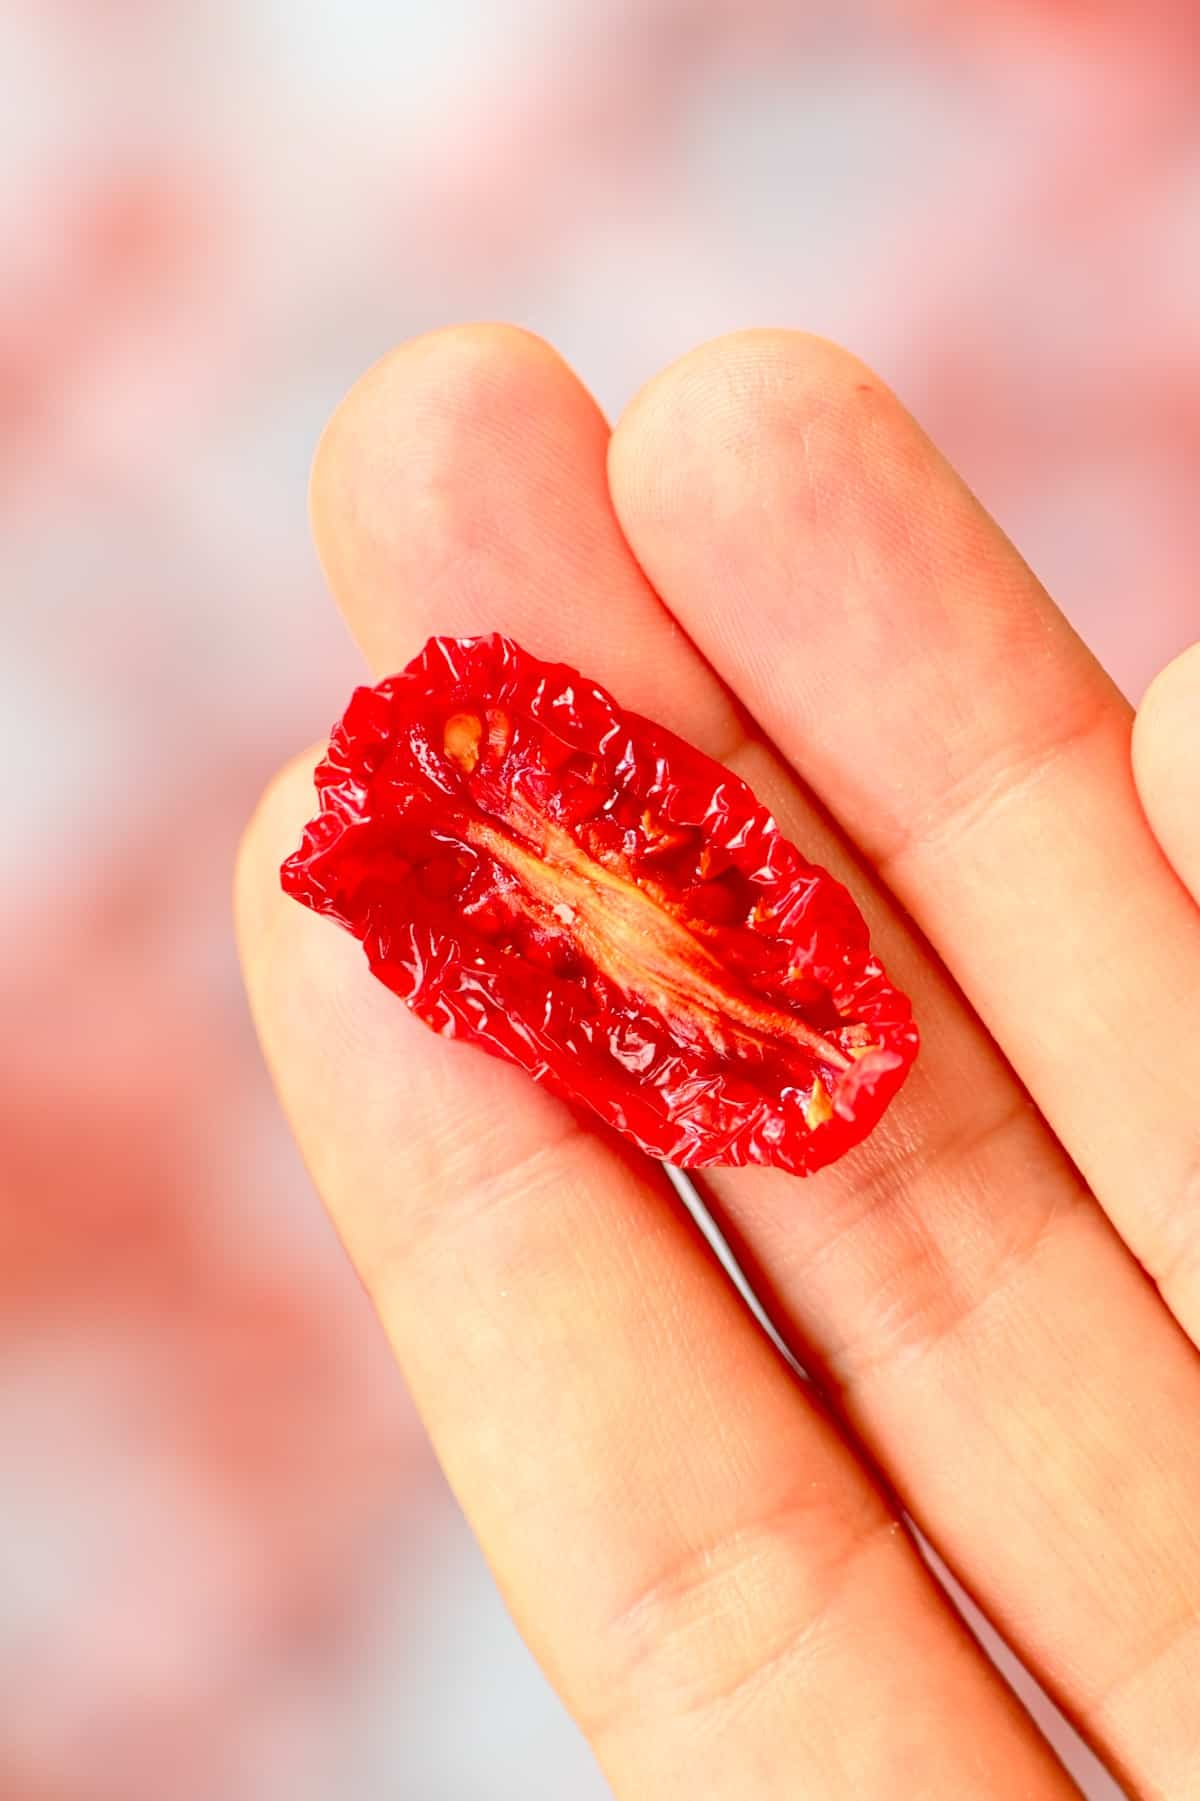 A sun dried tomato in a hand